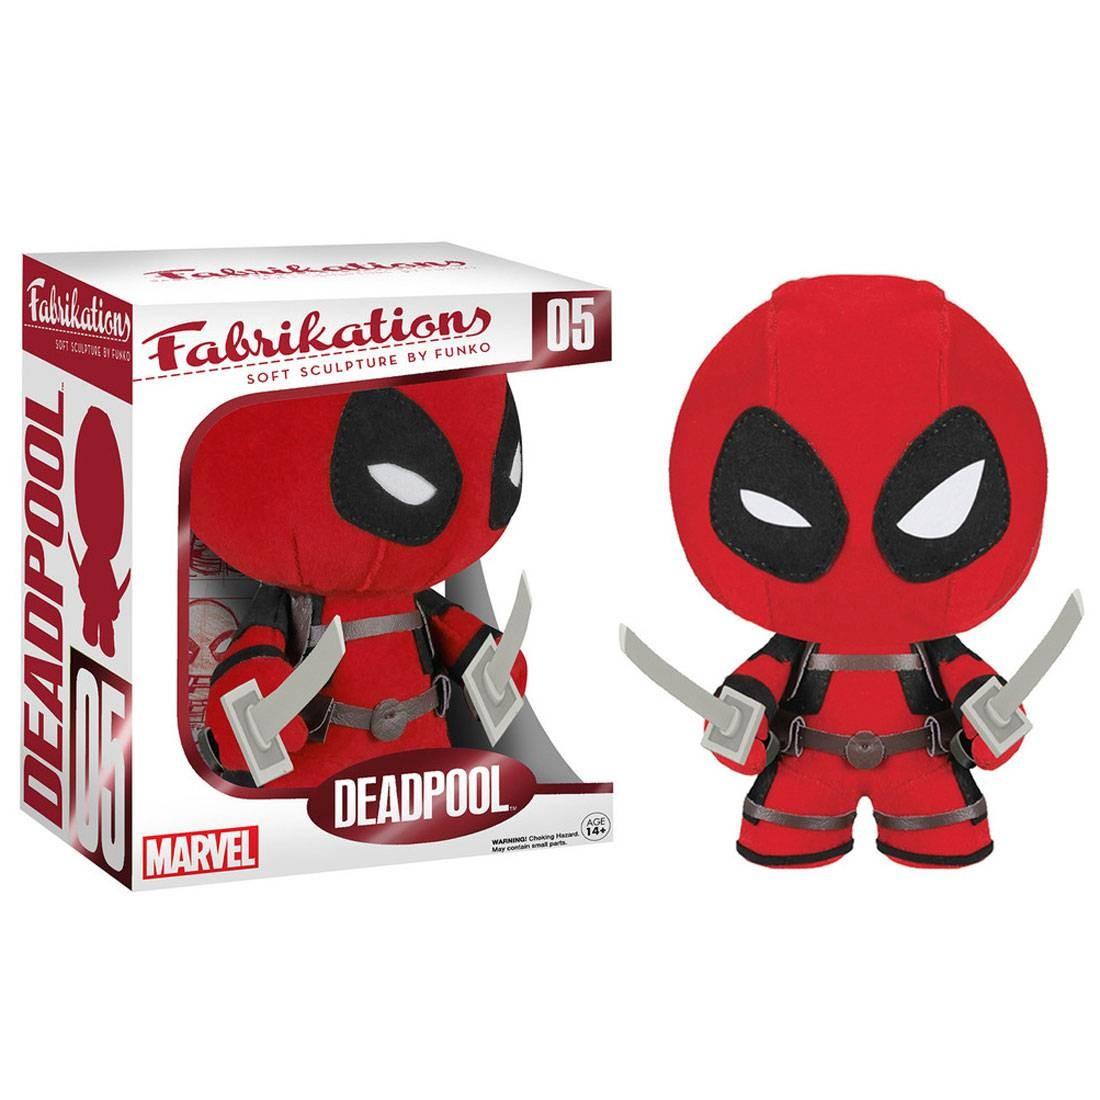 Funko Fabrikations Marvel Deadpool Plush red